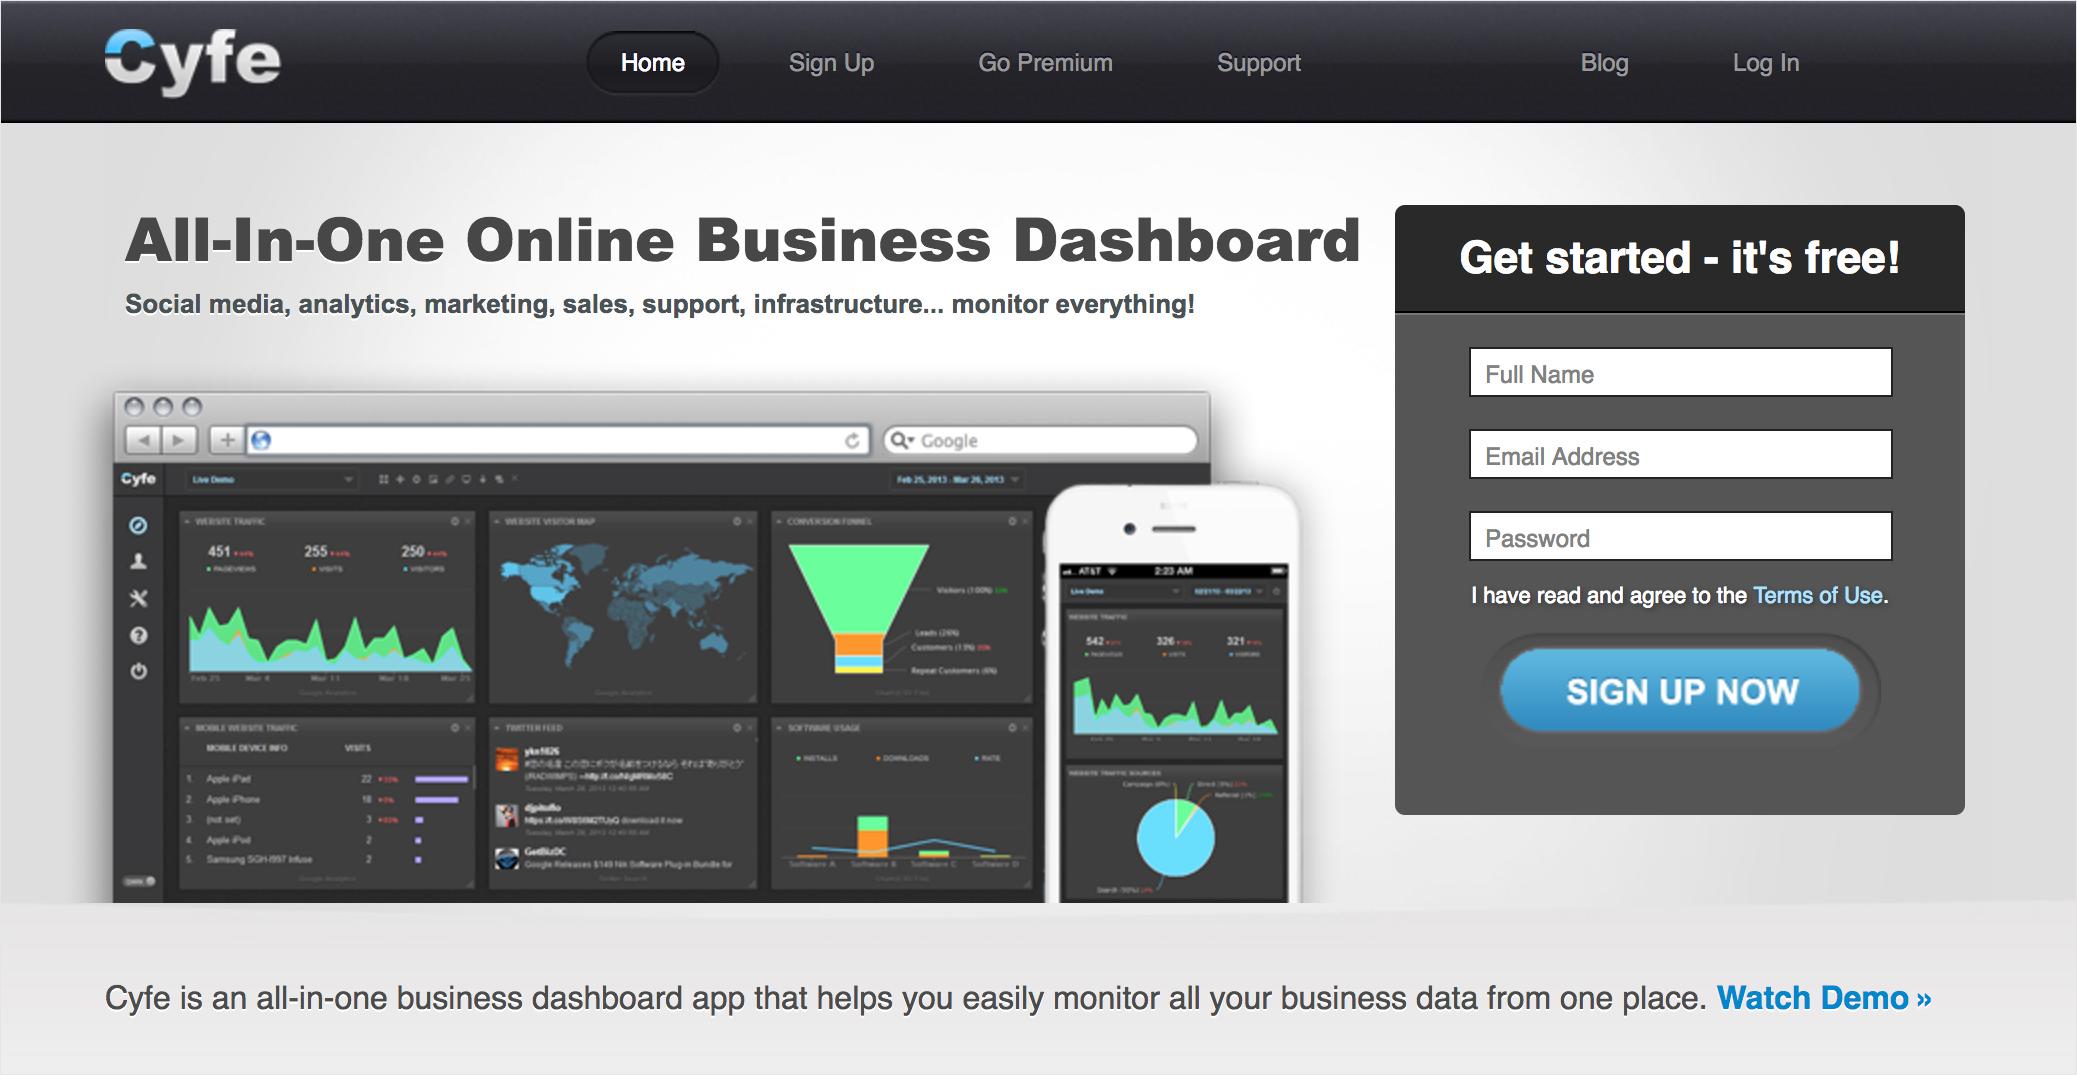 cyfe screenshot digital marketing tool ann smarty tips